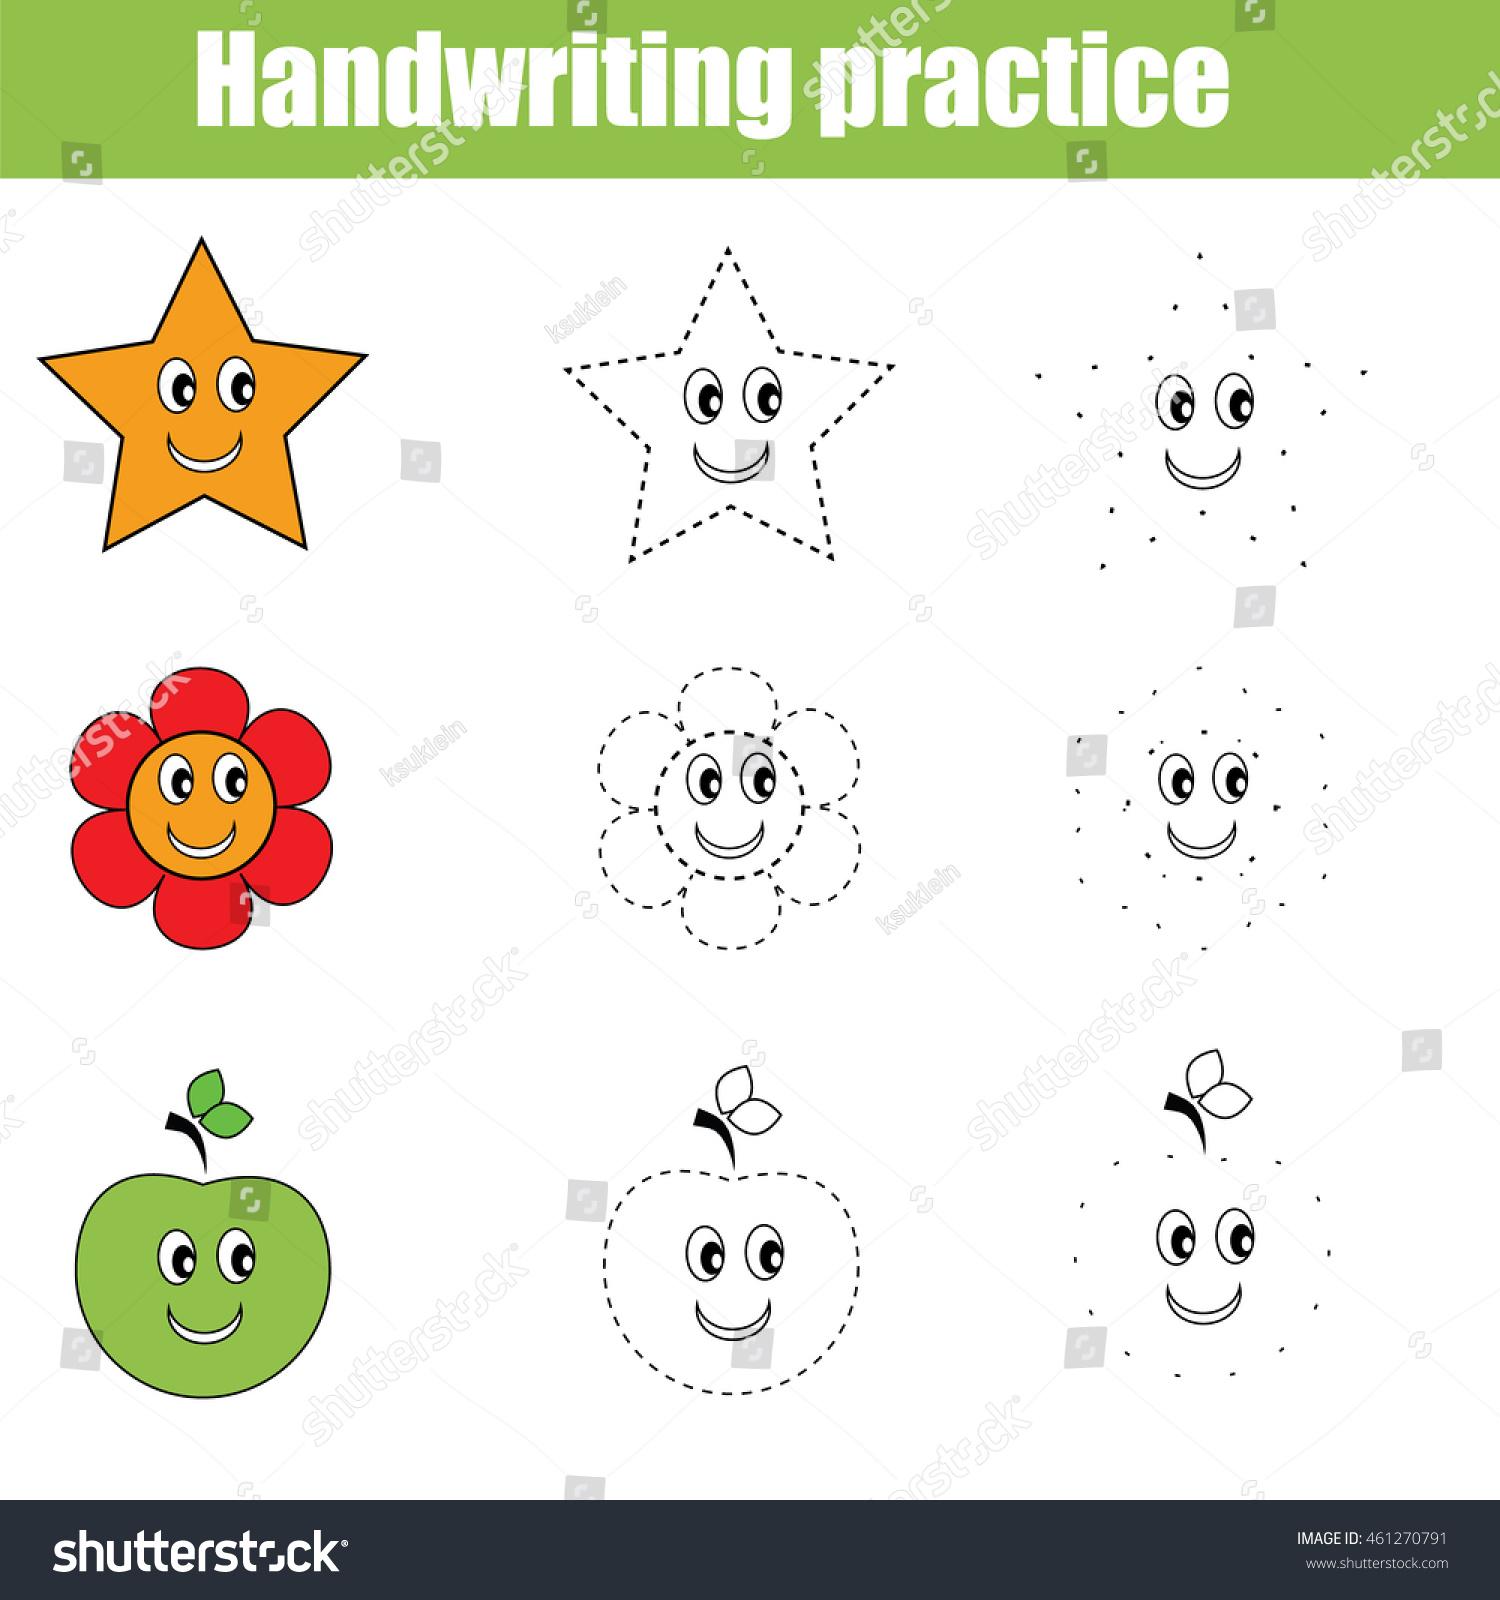 handwriting practice sheet educational children game stock